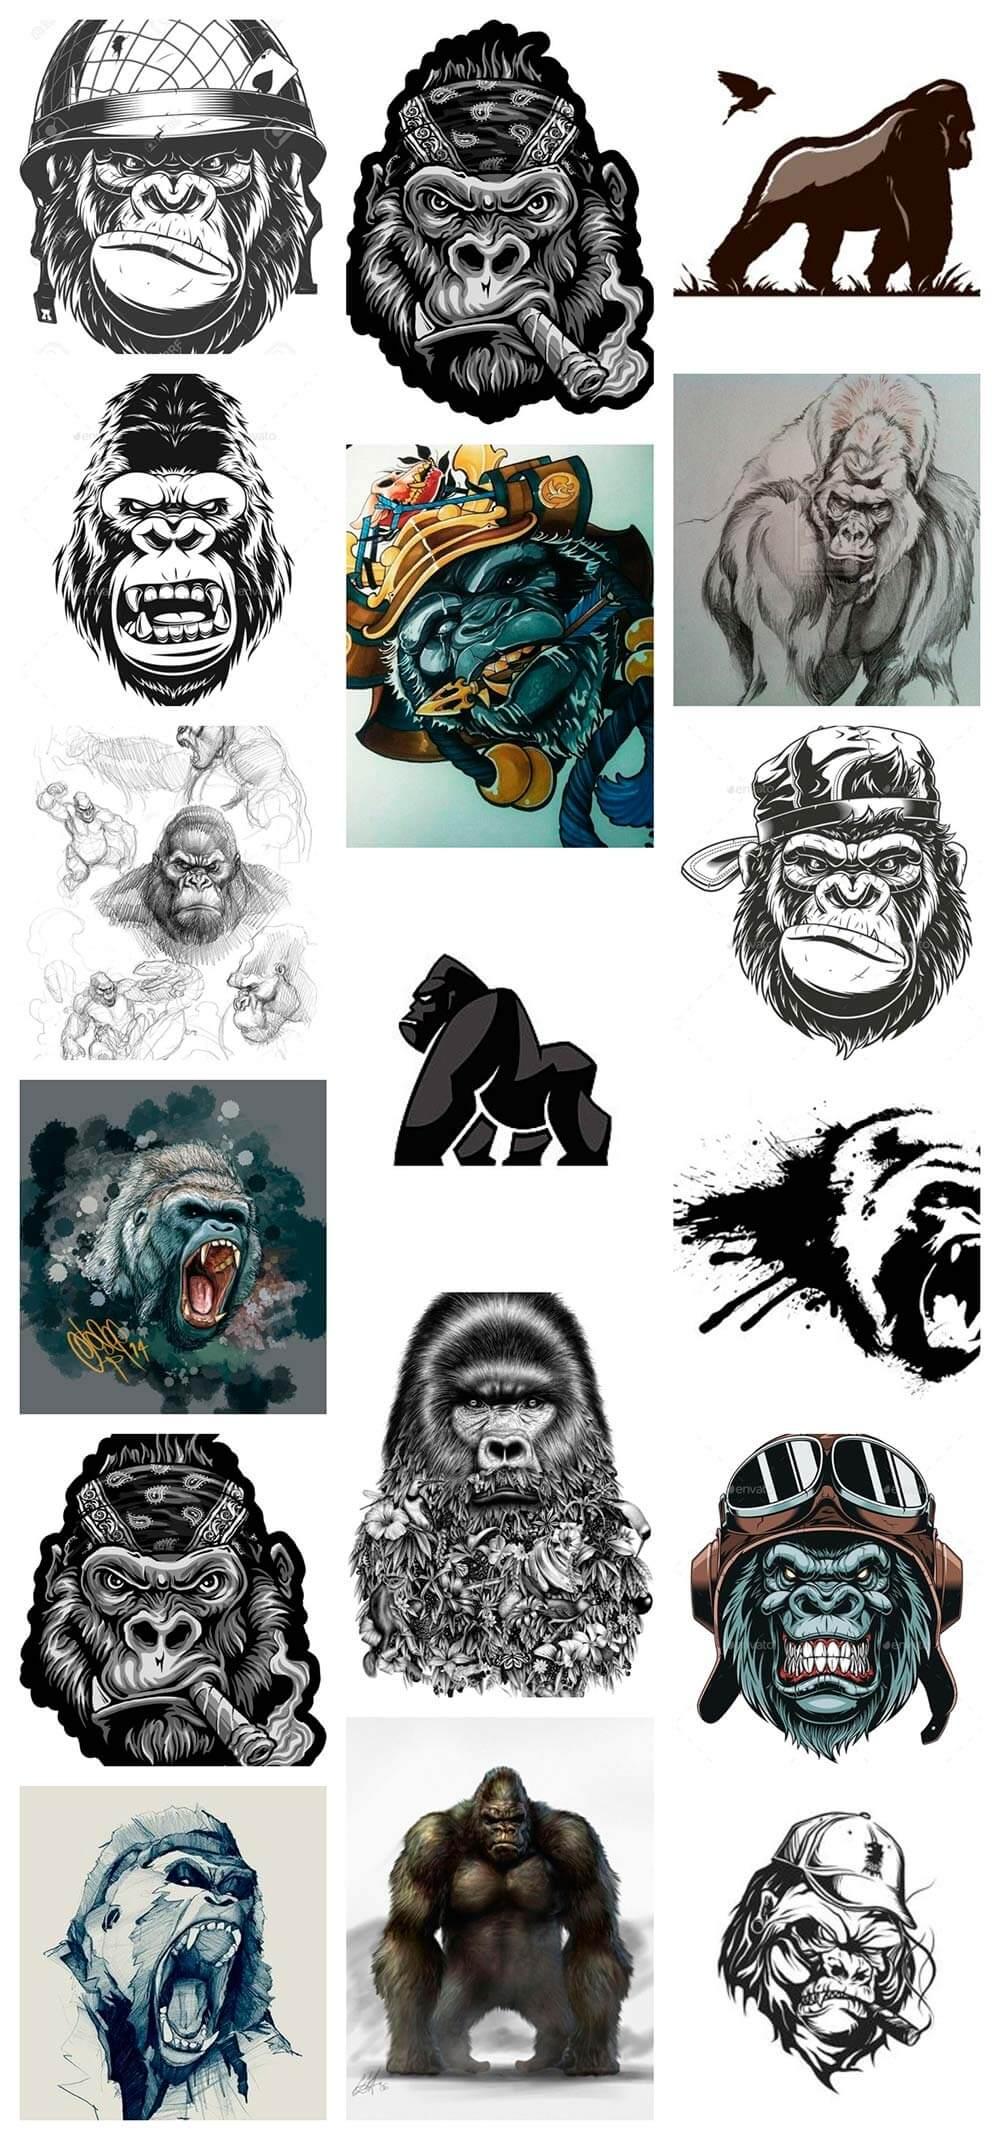 Bocetos De Tatuajes Tradicionales ᐈ tatuajes gorilas : ideas y significado - camaleon tattoo